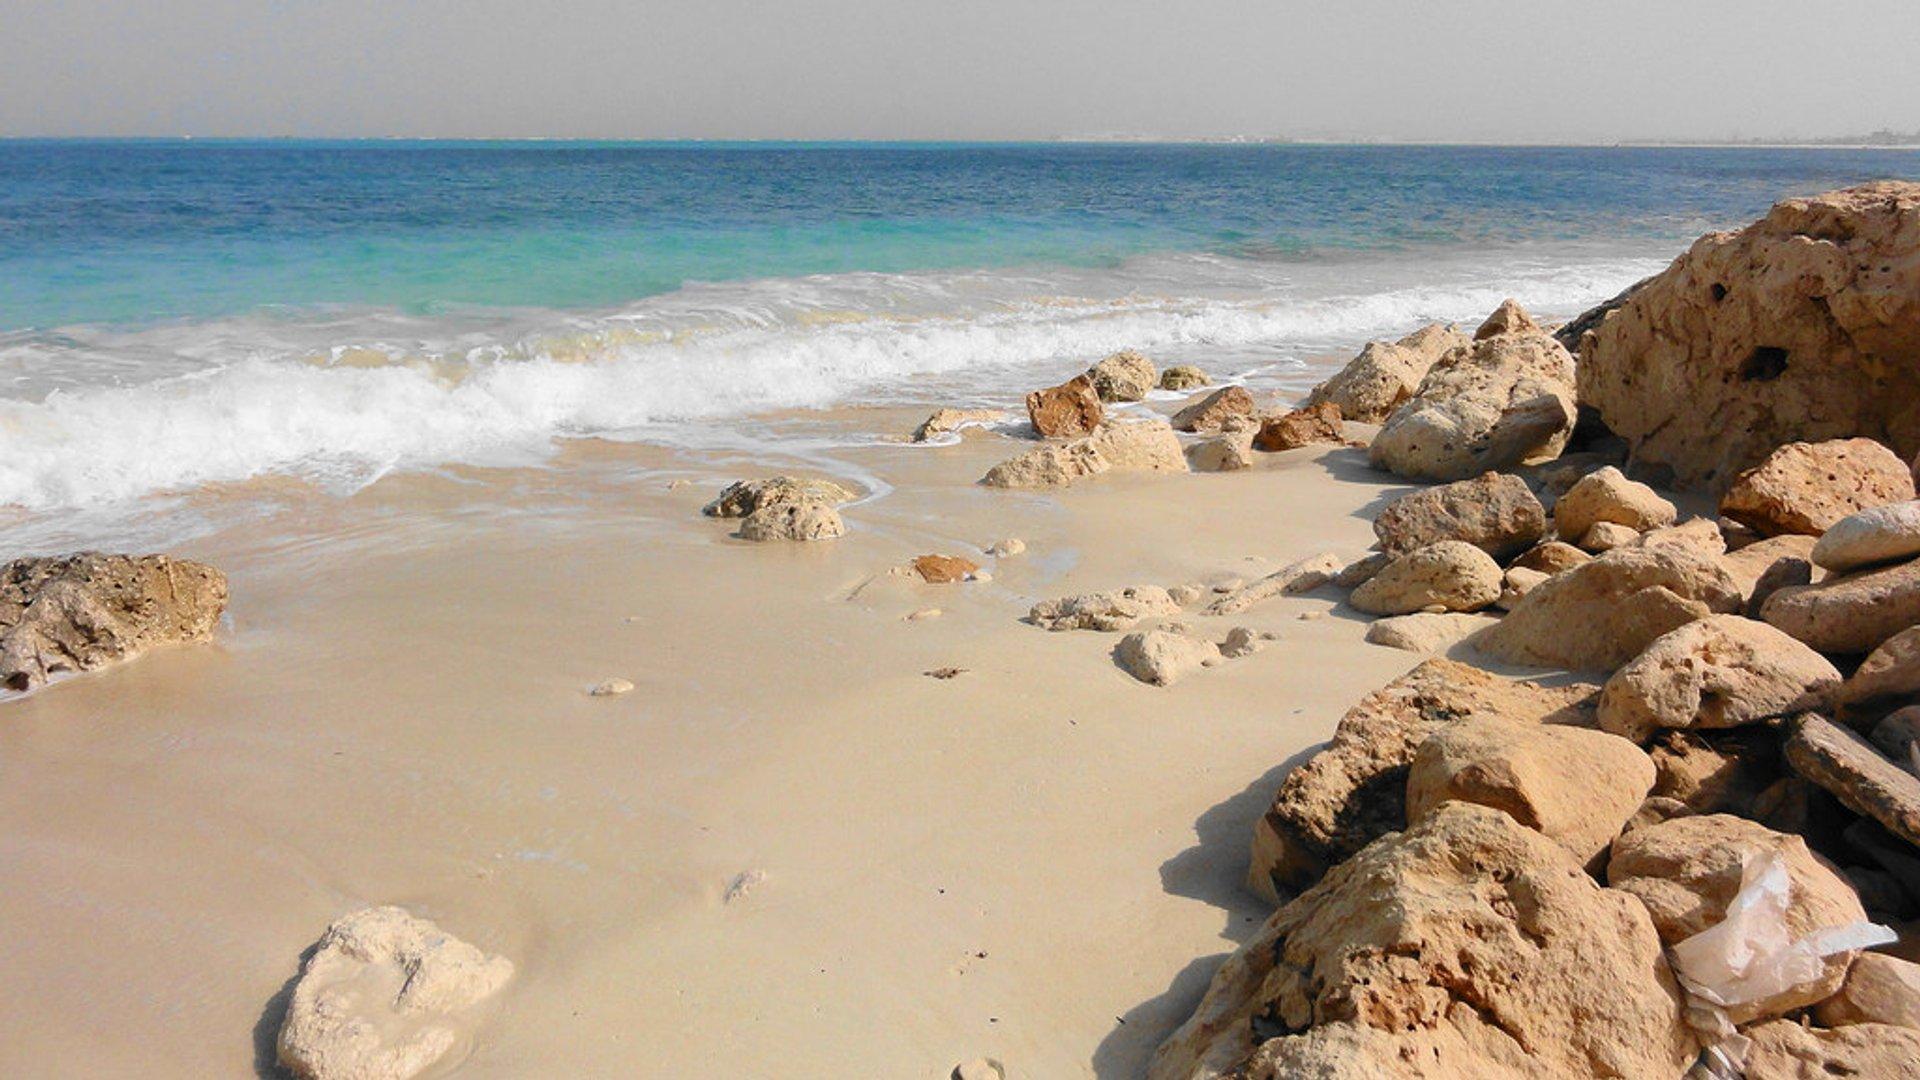 Mediterranean Sea Beach Season in Egypt 2020 - Best Time